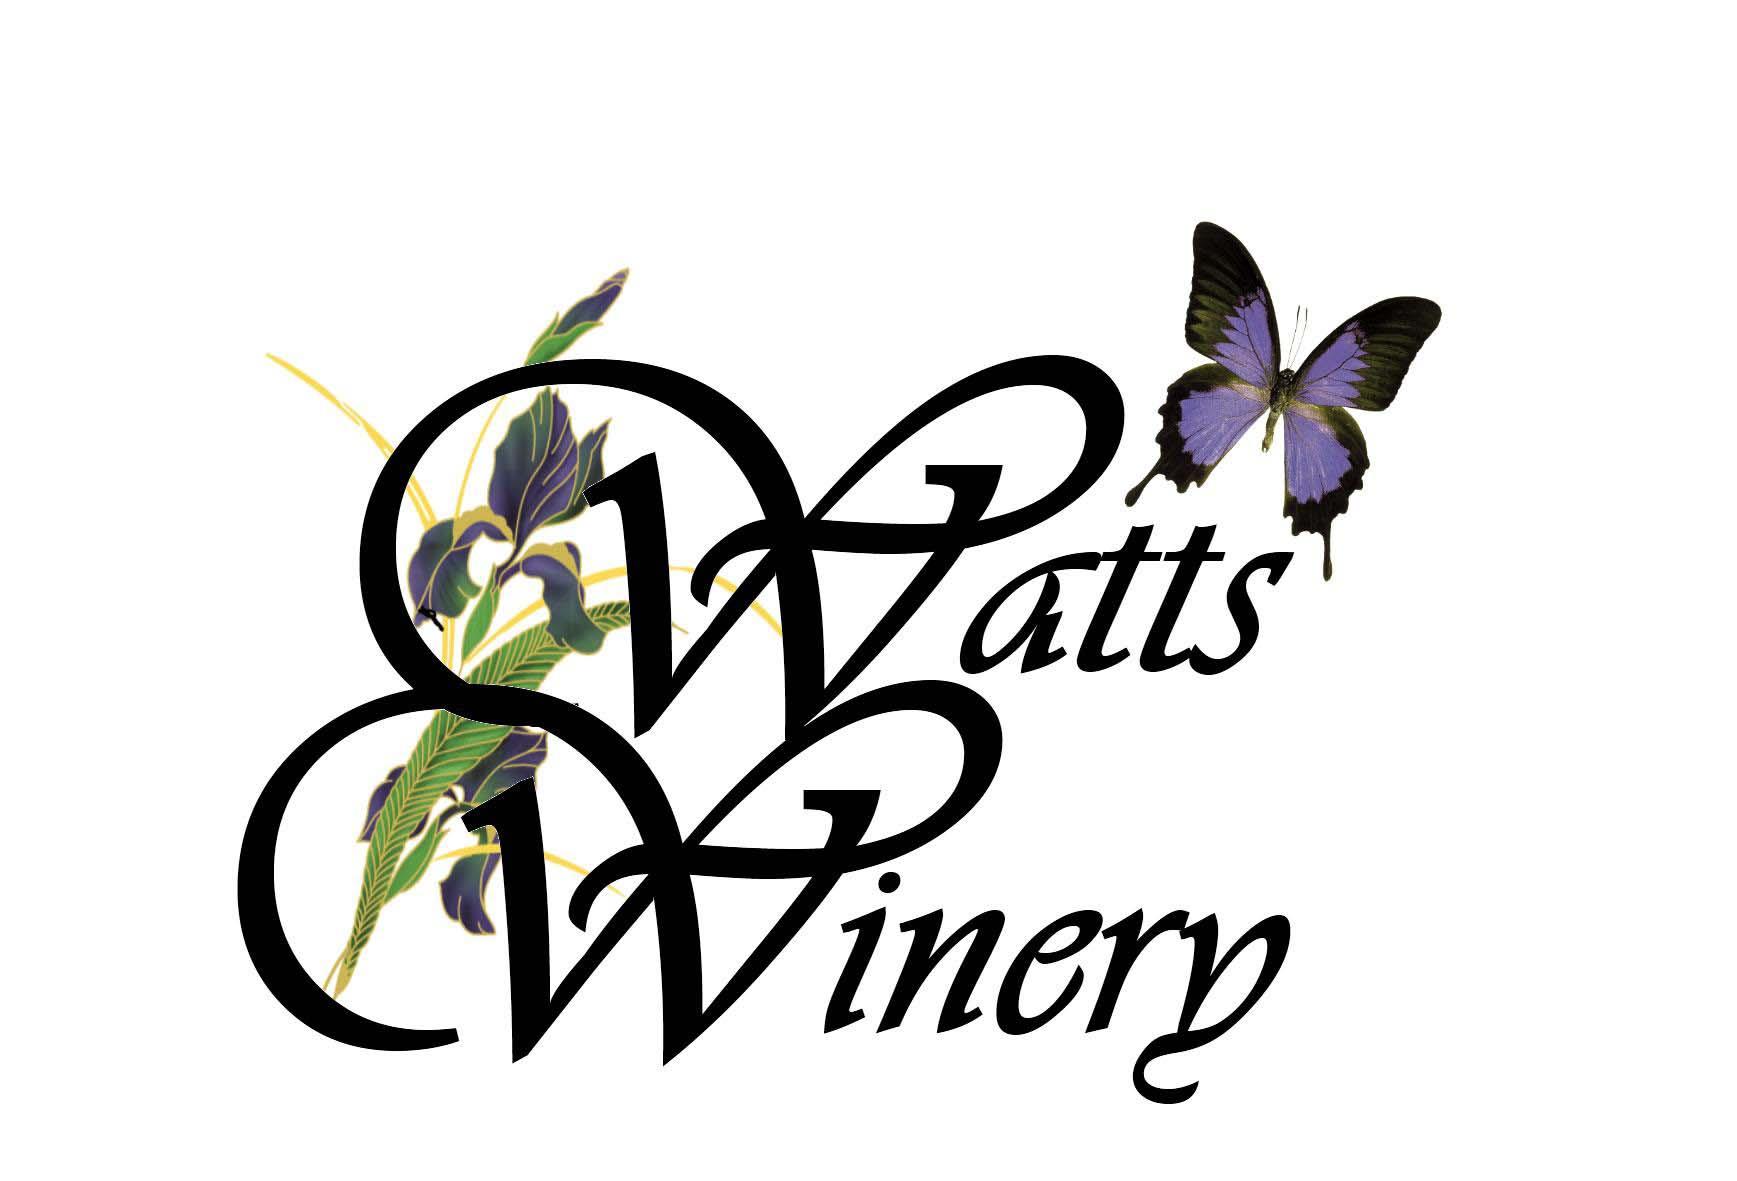 watts-logo-butterfly-and-logo---dl.jpg